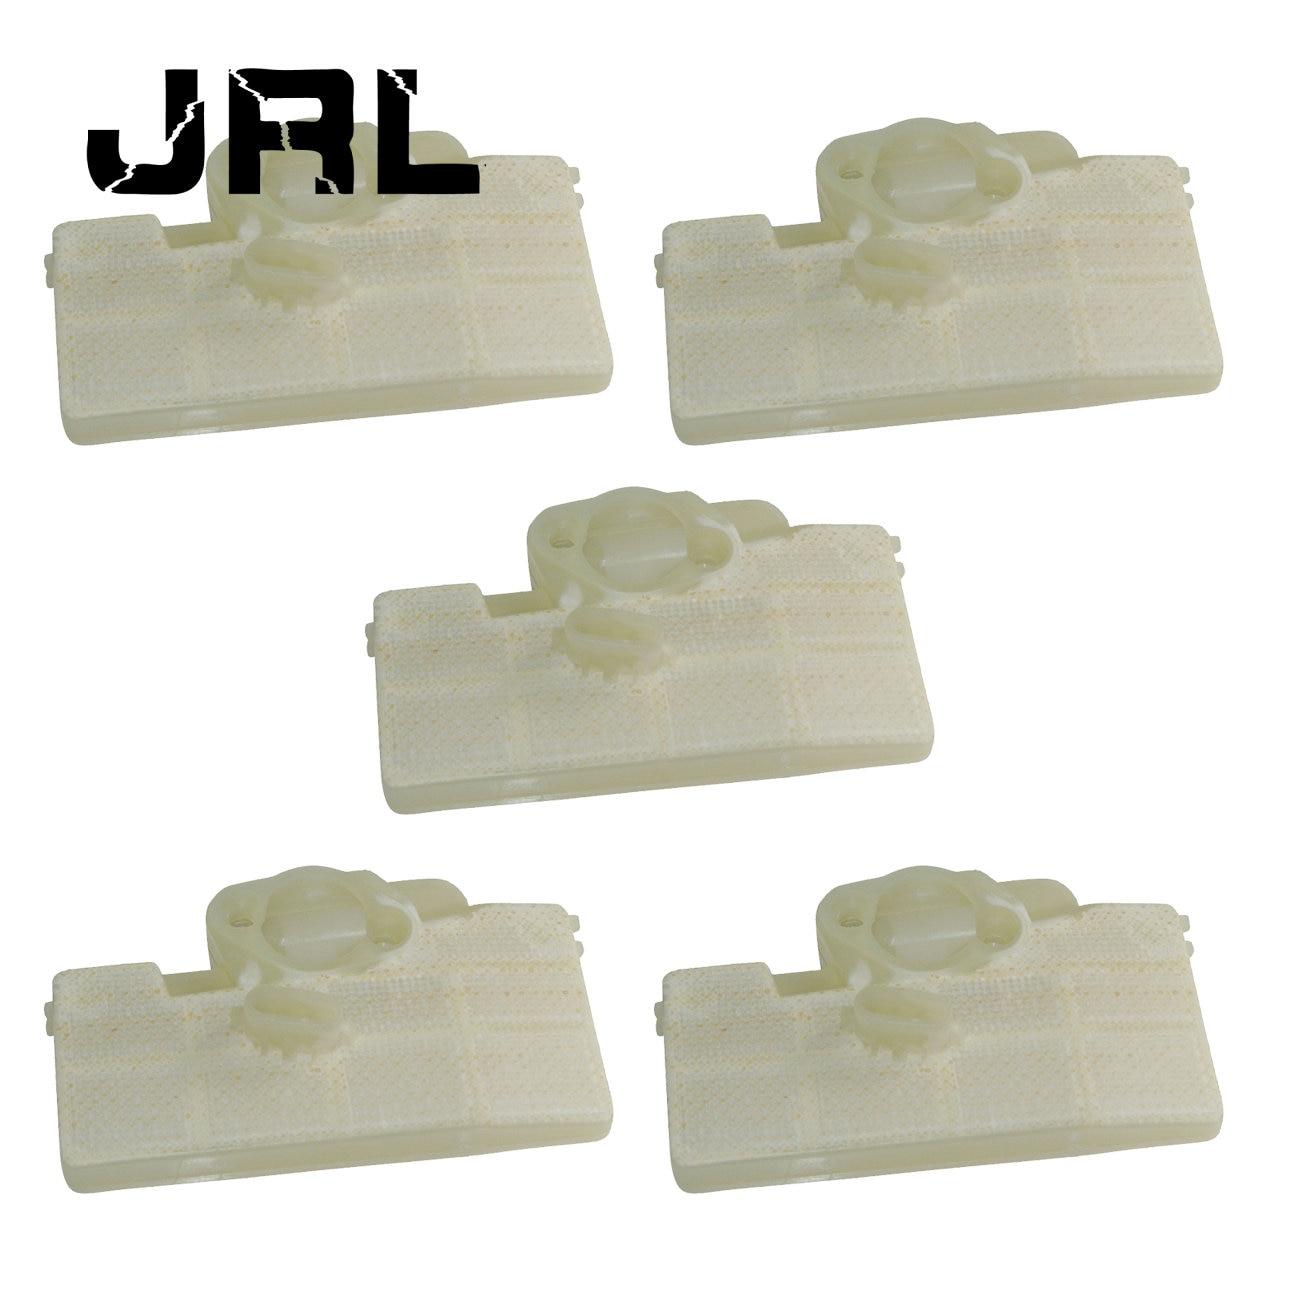 5 * conjunto de filtro de aire adecuado para Stihl MS390 039 MS310 MS290 motosierra Nylon Nesh